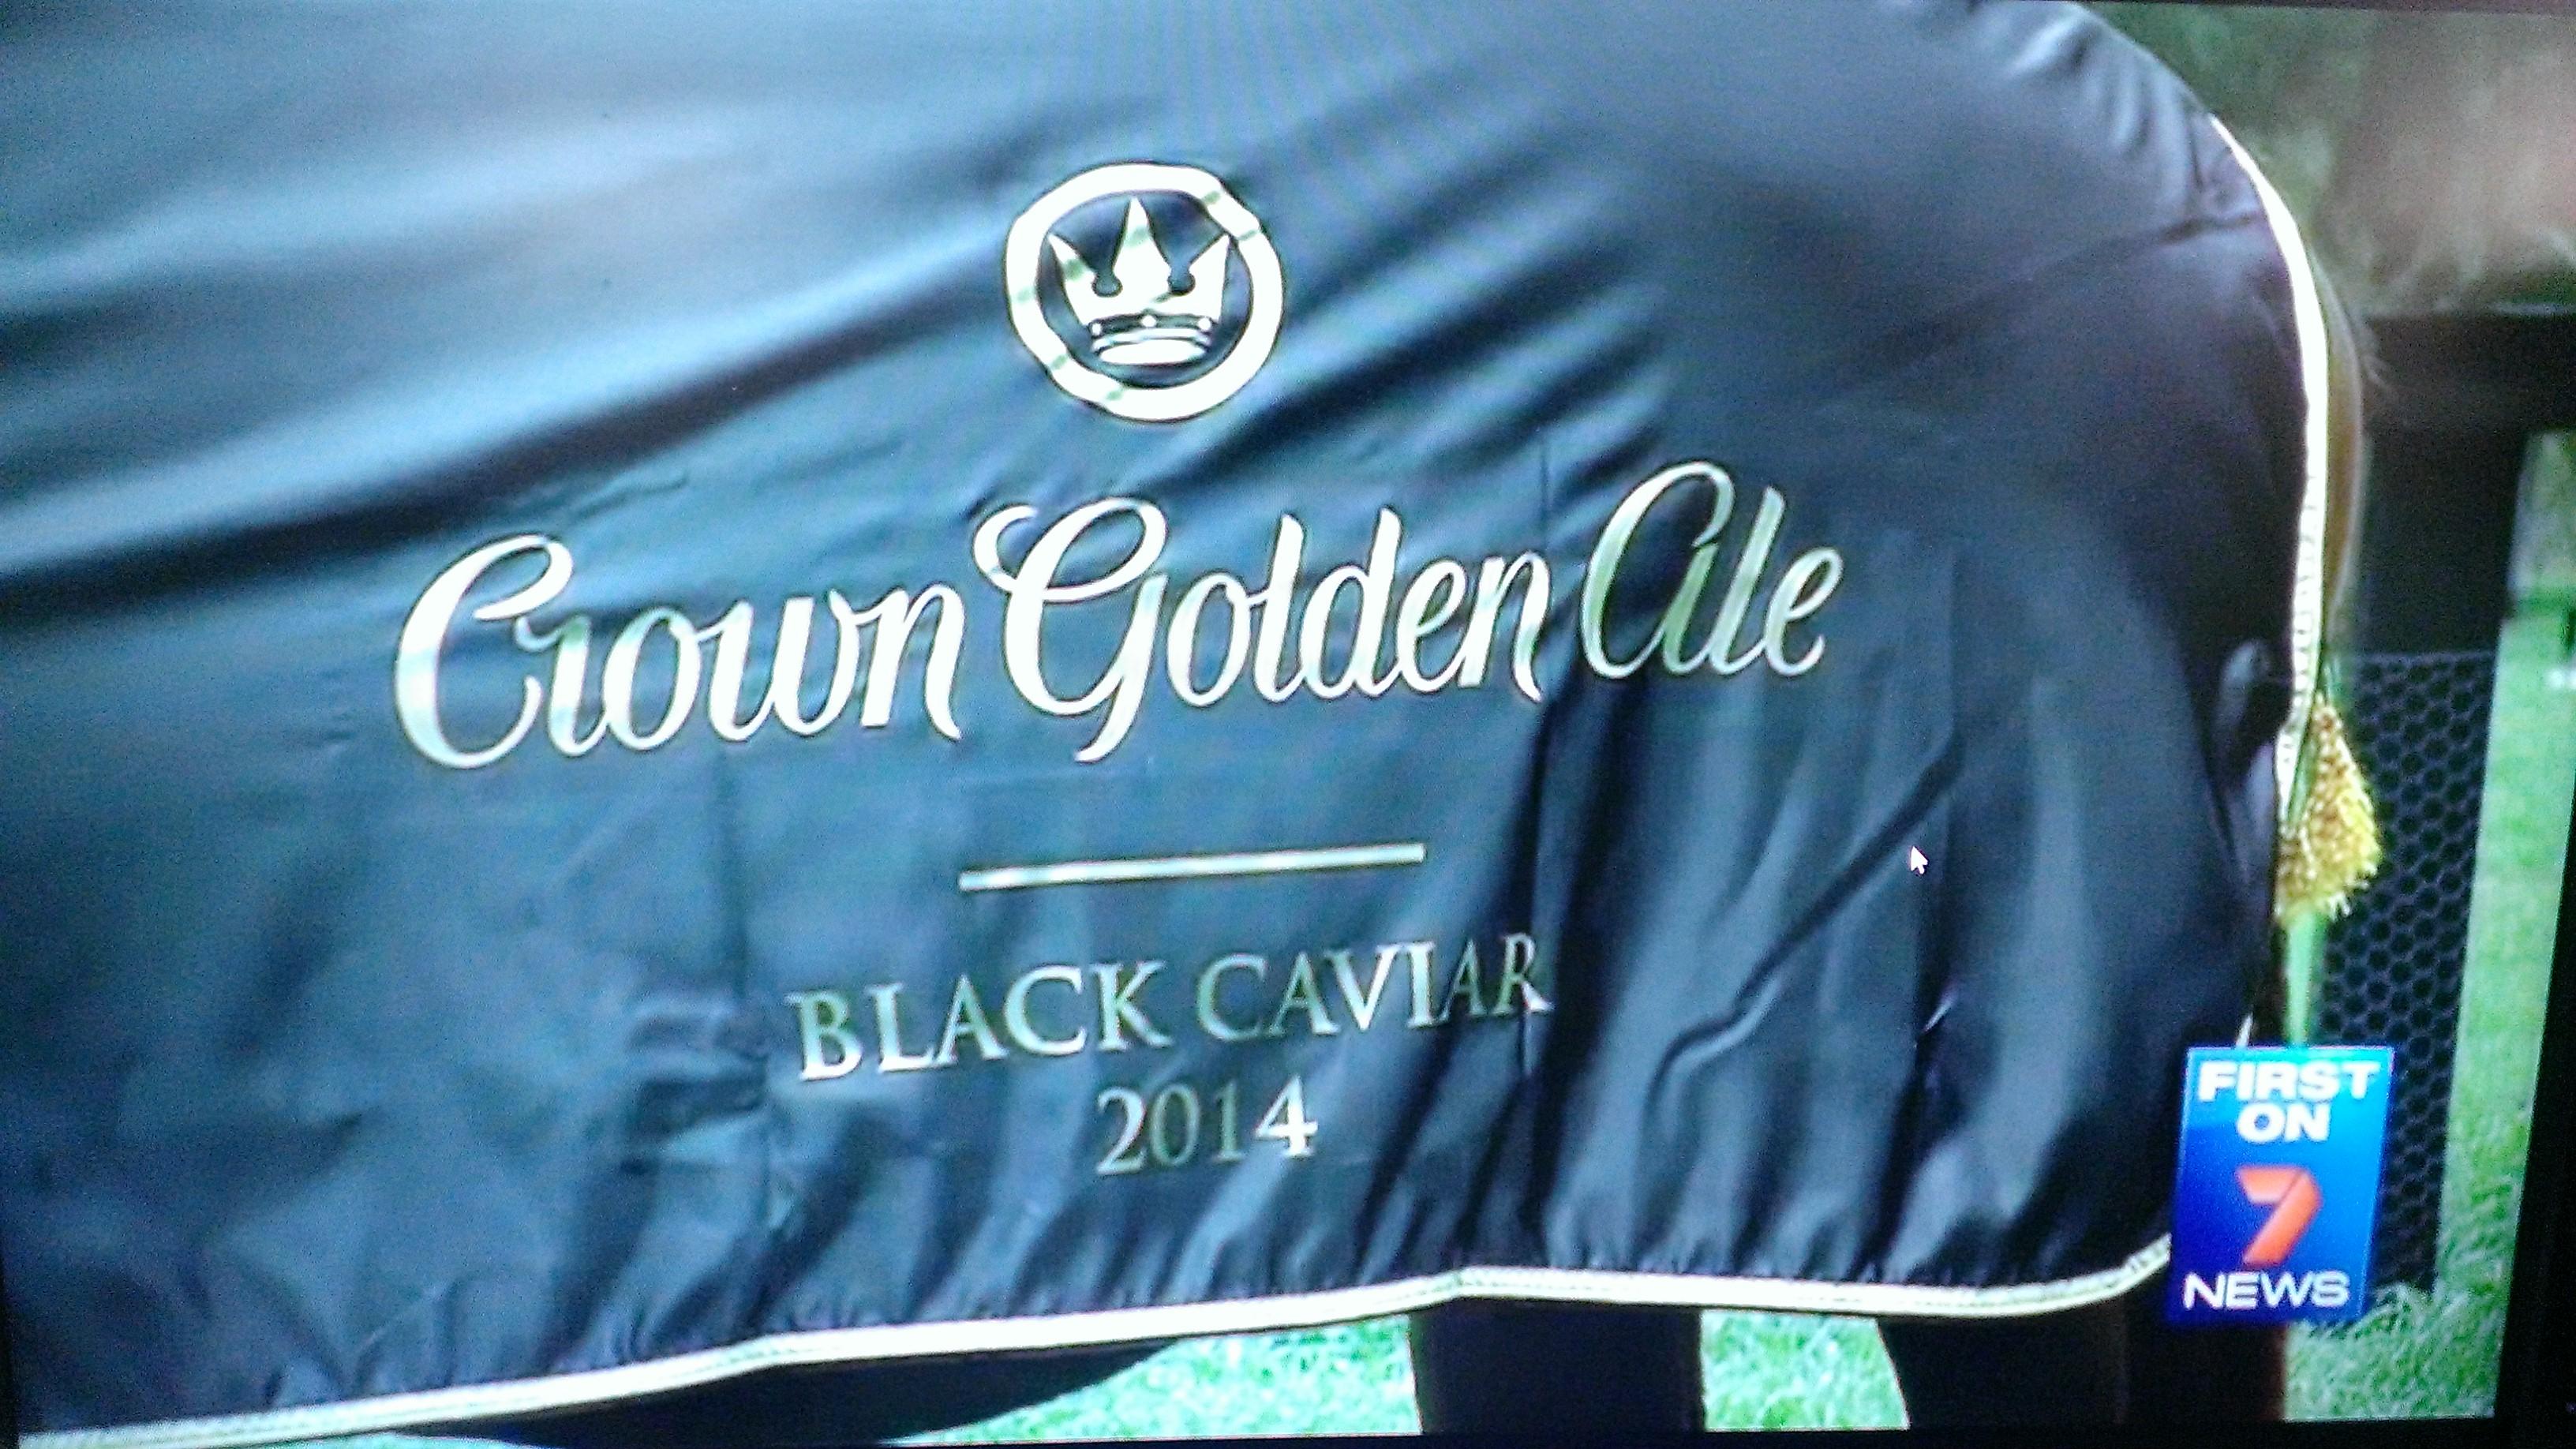 BLACK CAVIAR HORSE RUGS